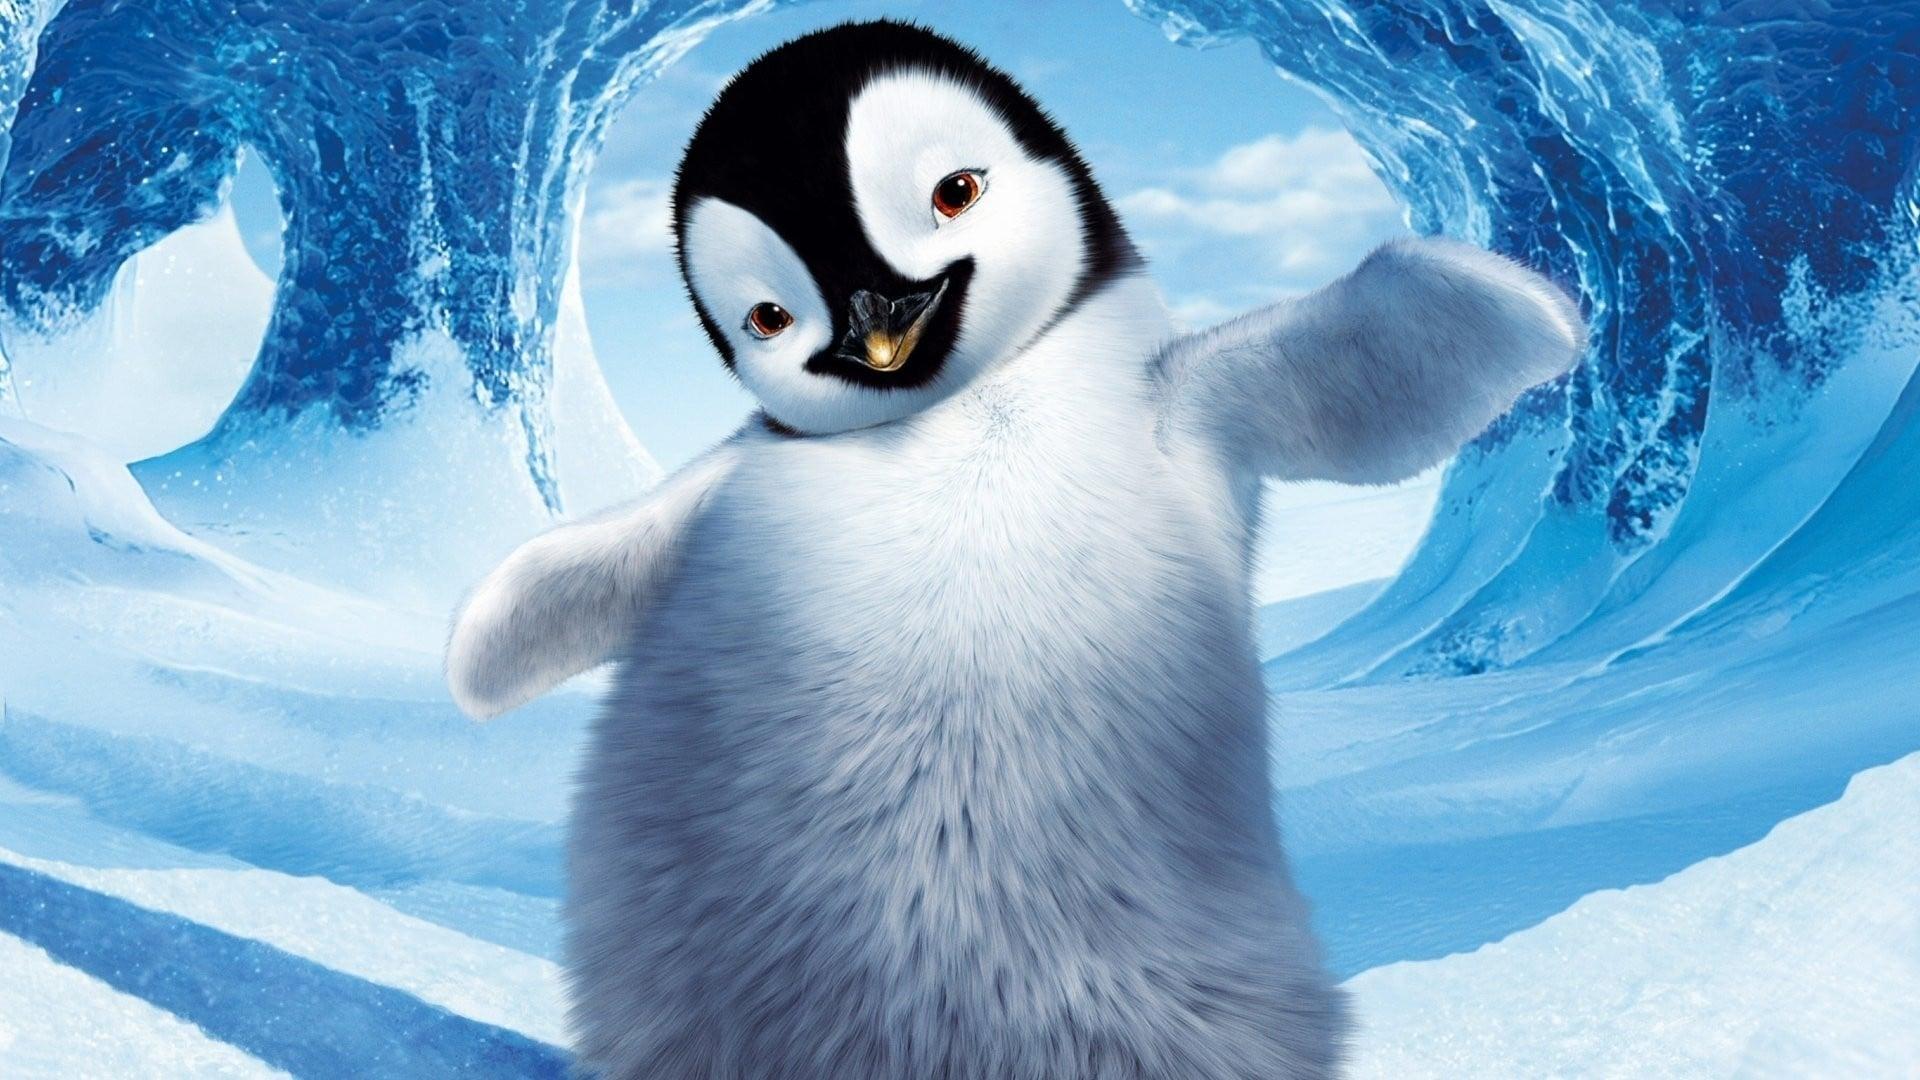 Assistir Happy Feet 2 O Pinguim Online Dublado Em Full Hd 1080p